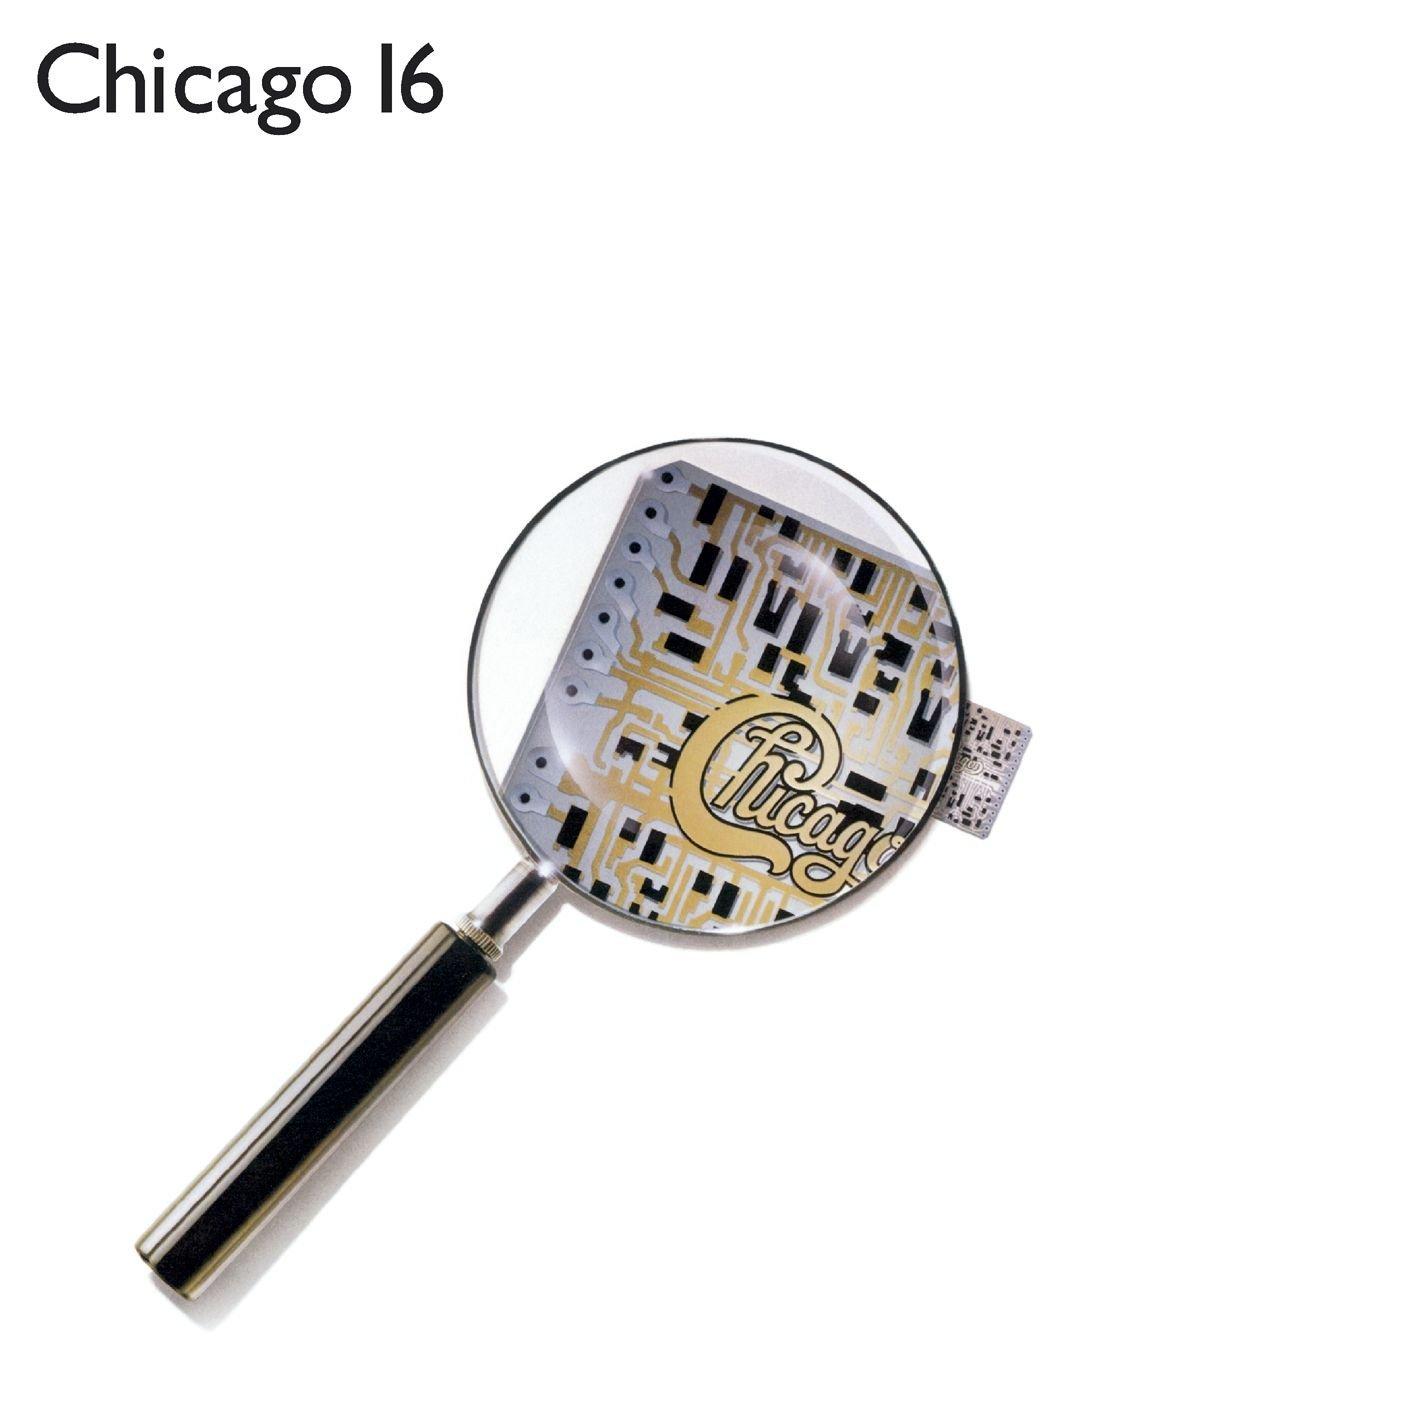 Chicago Chicago 16 Amazon Com Music